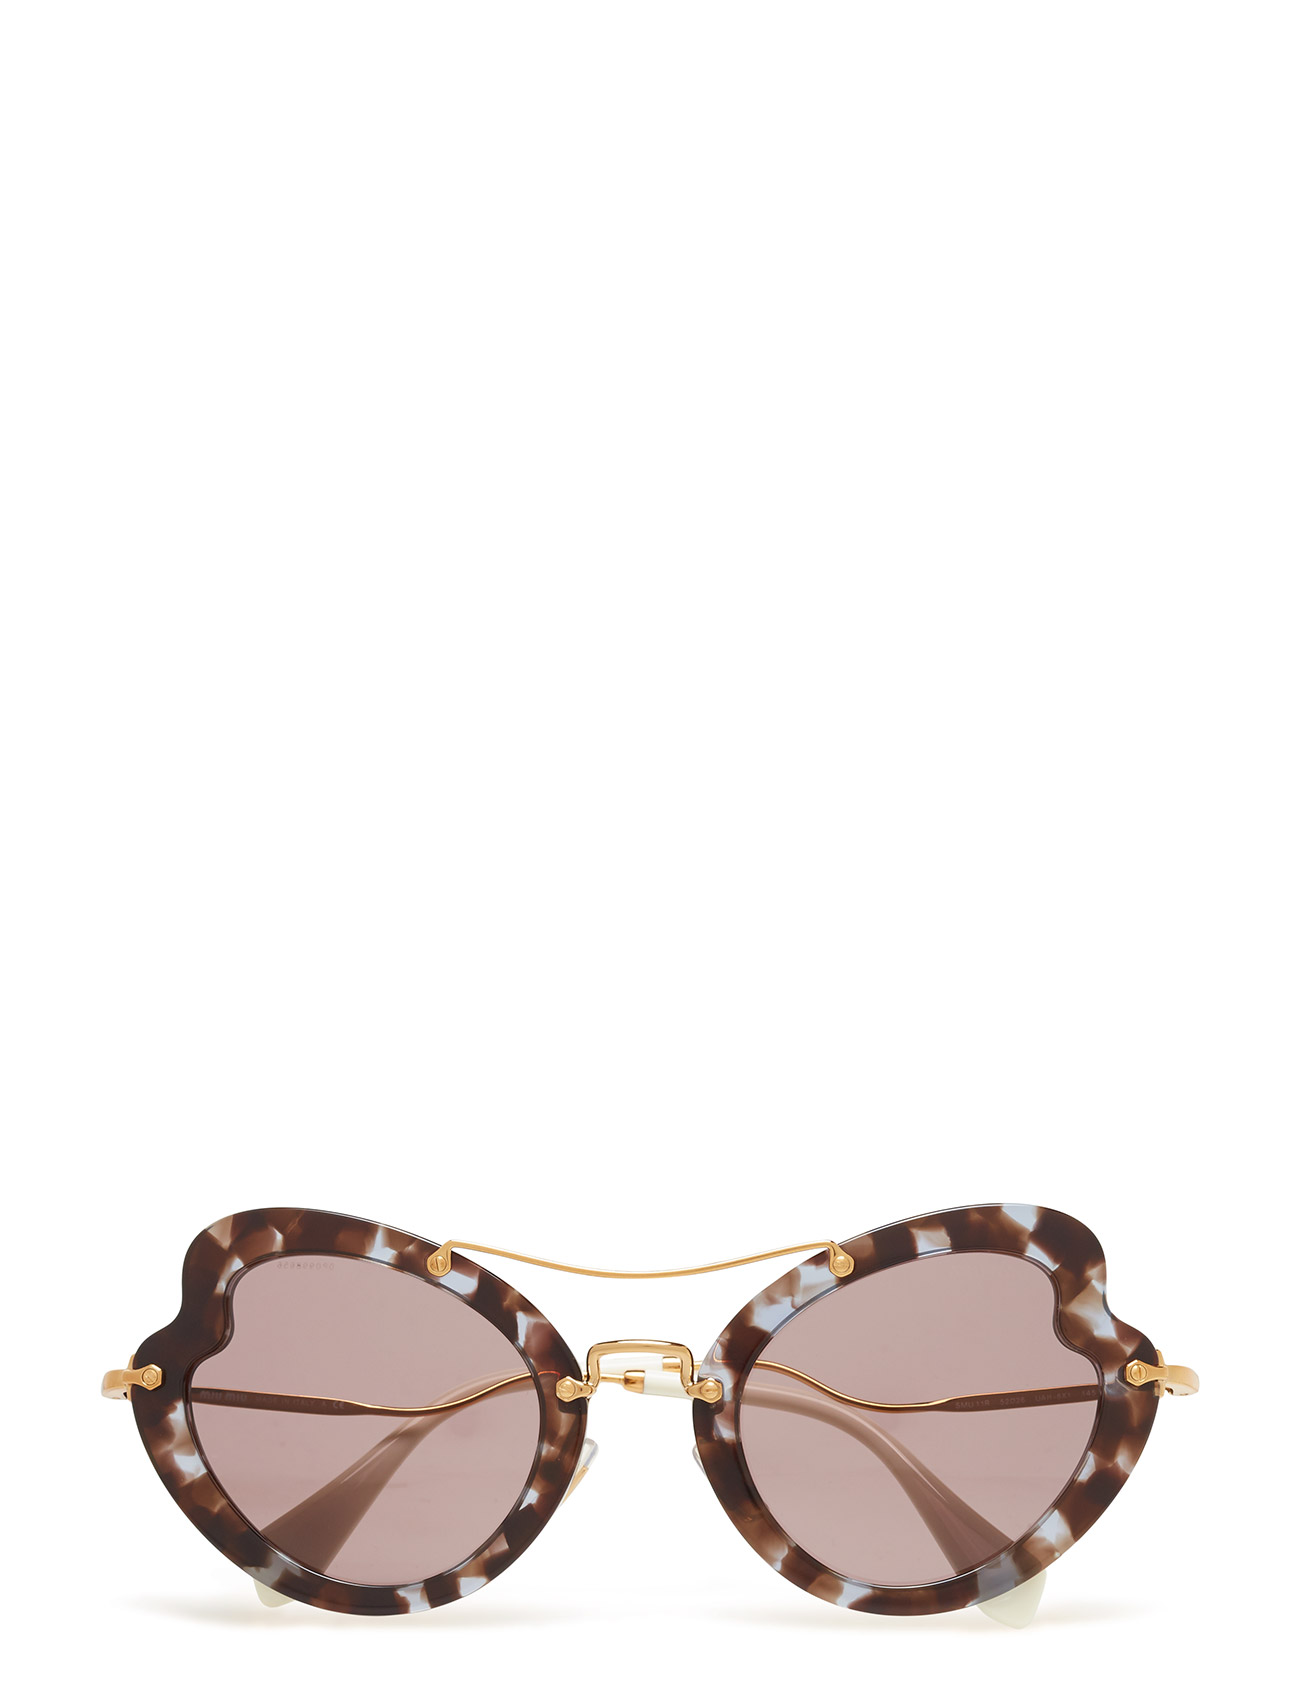 Cat Eye Miu Miu Sunglasses Solbriller til Damer i Sort